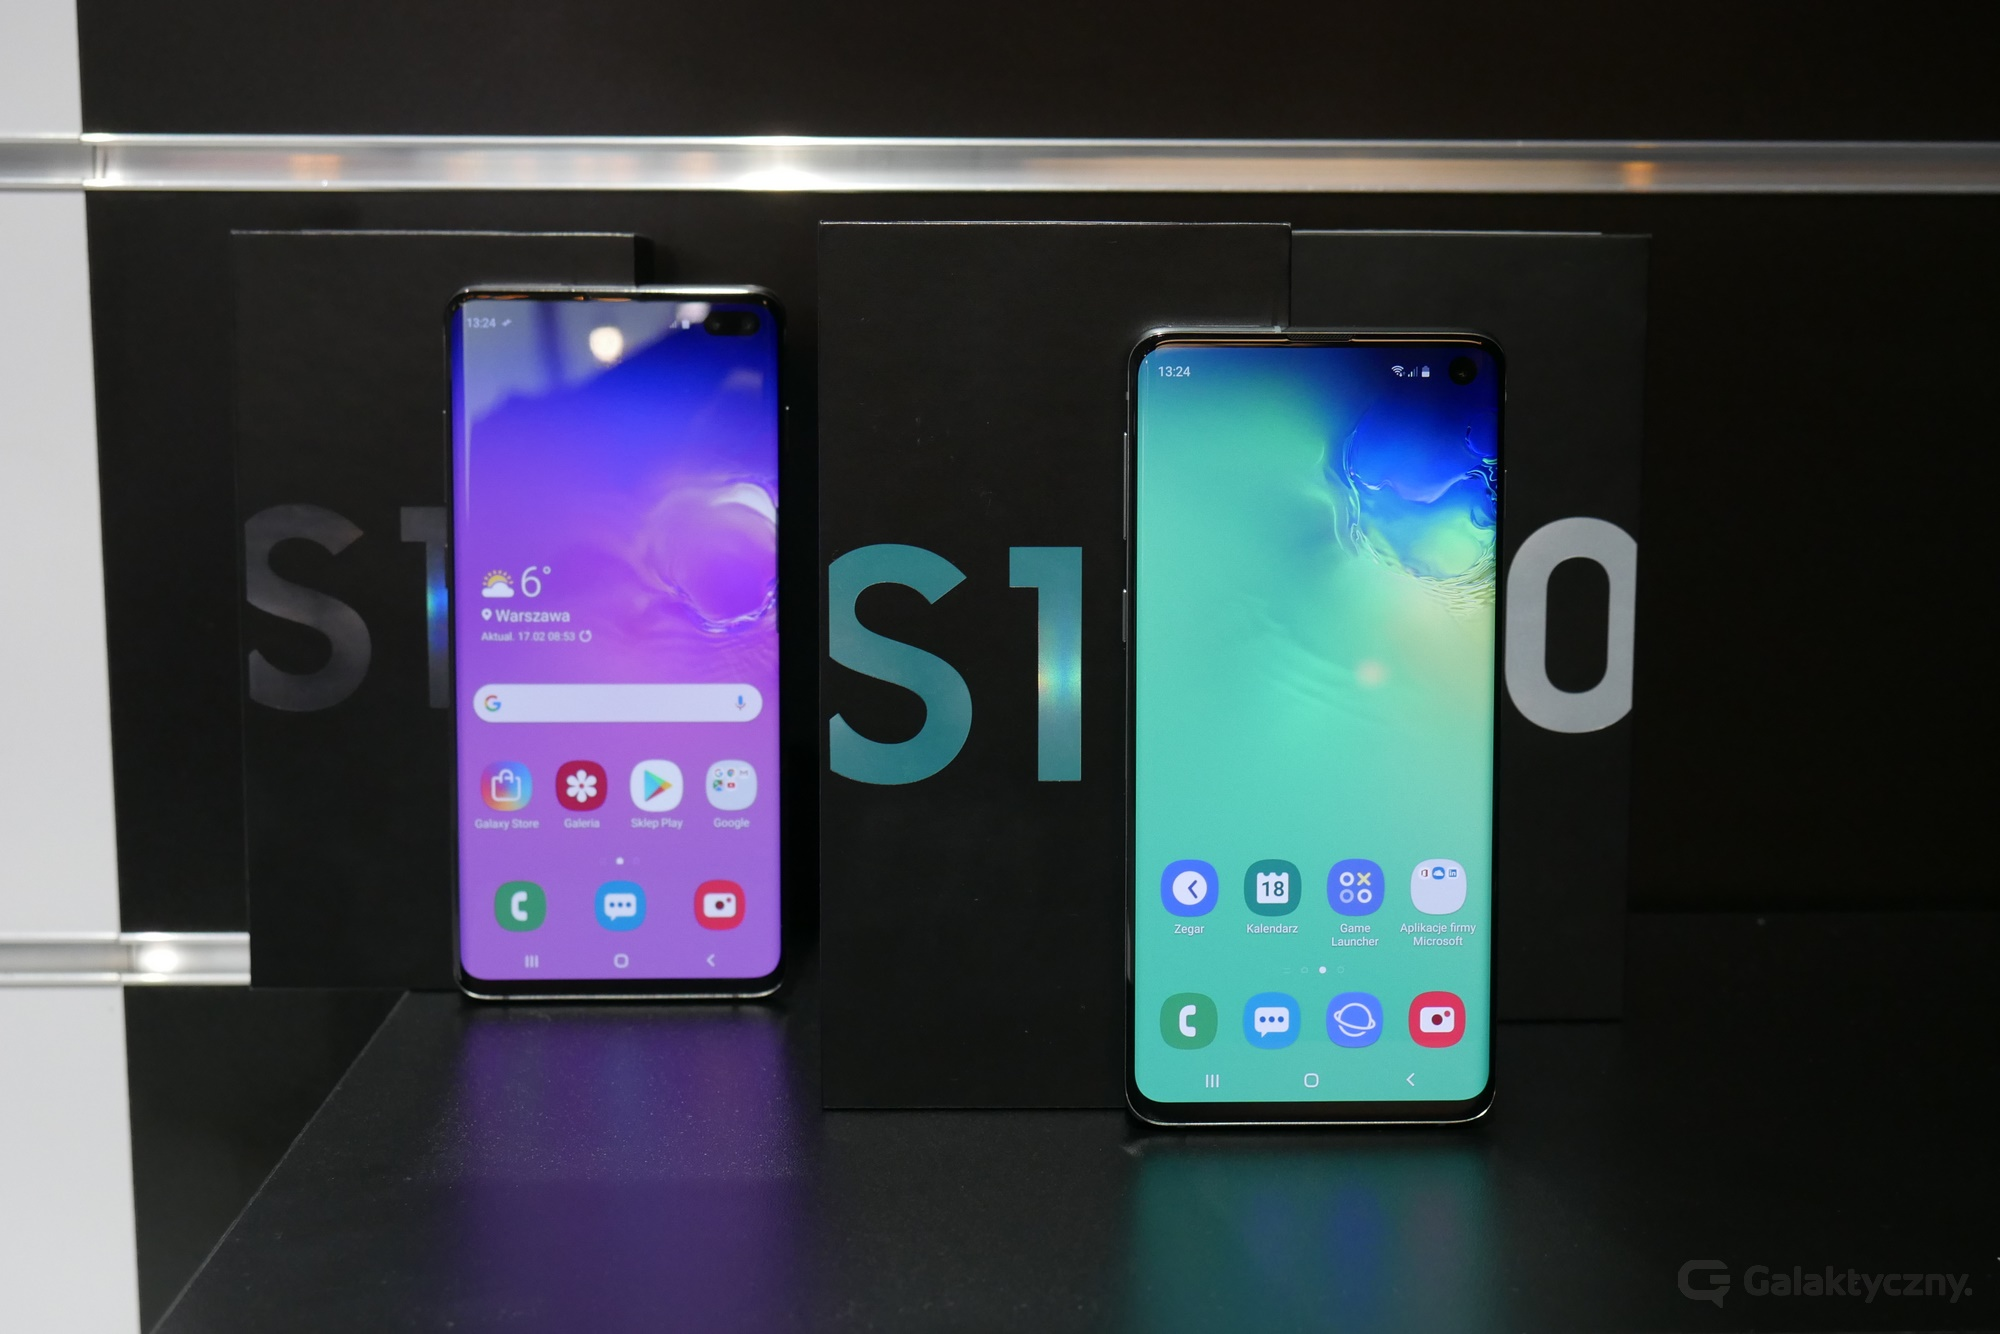 Samsung Galaxy S10 i Galaxy S10+